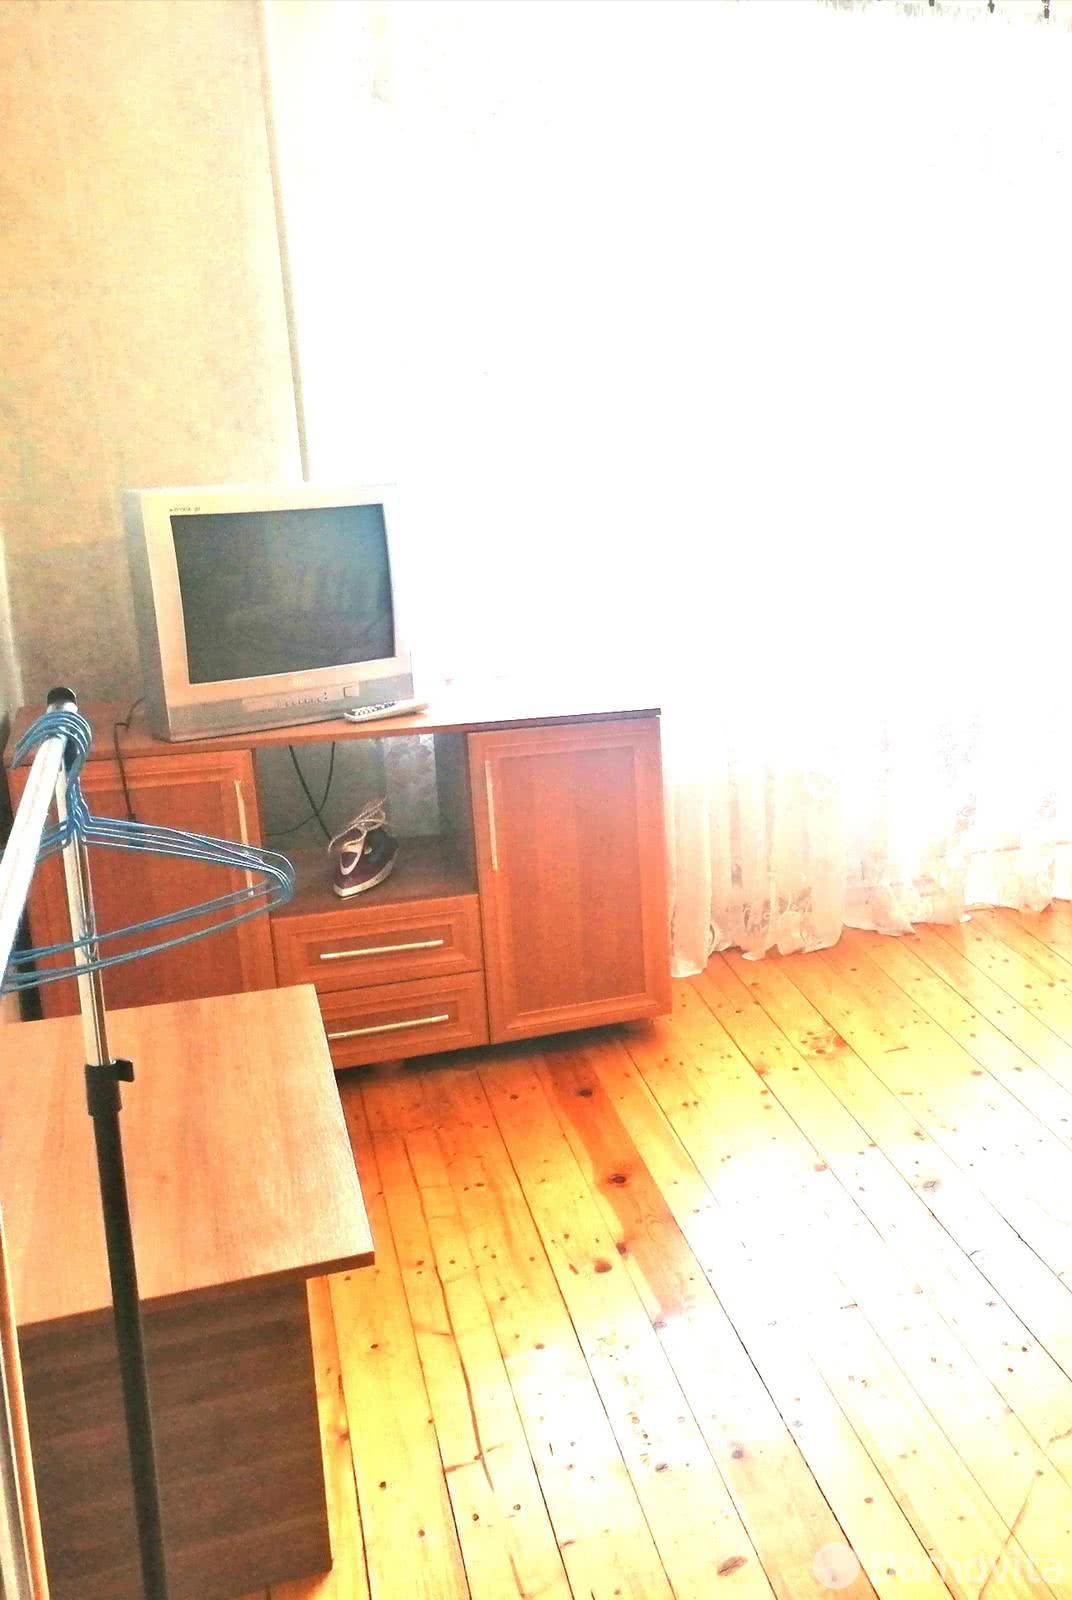 Аренда 1-комнатной квартиры на сутки в Минске ул. Немига, д. 10 - фото 2